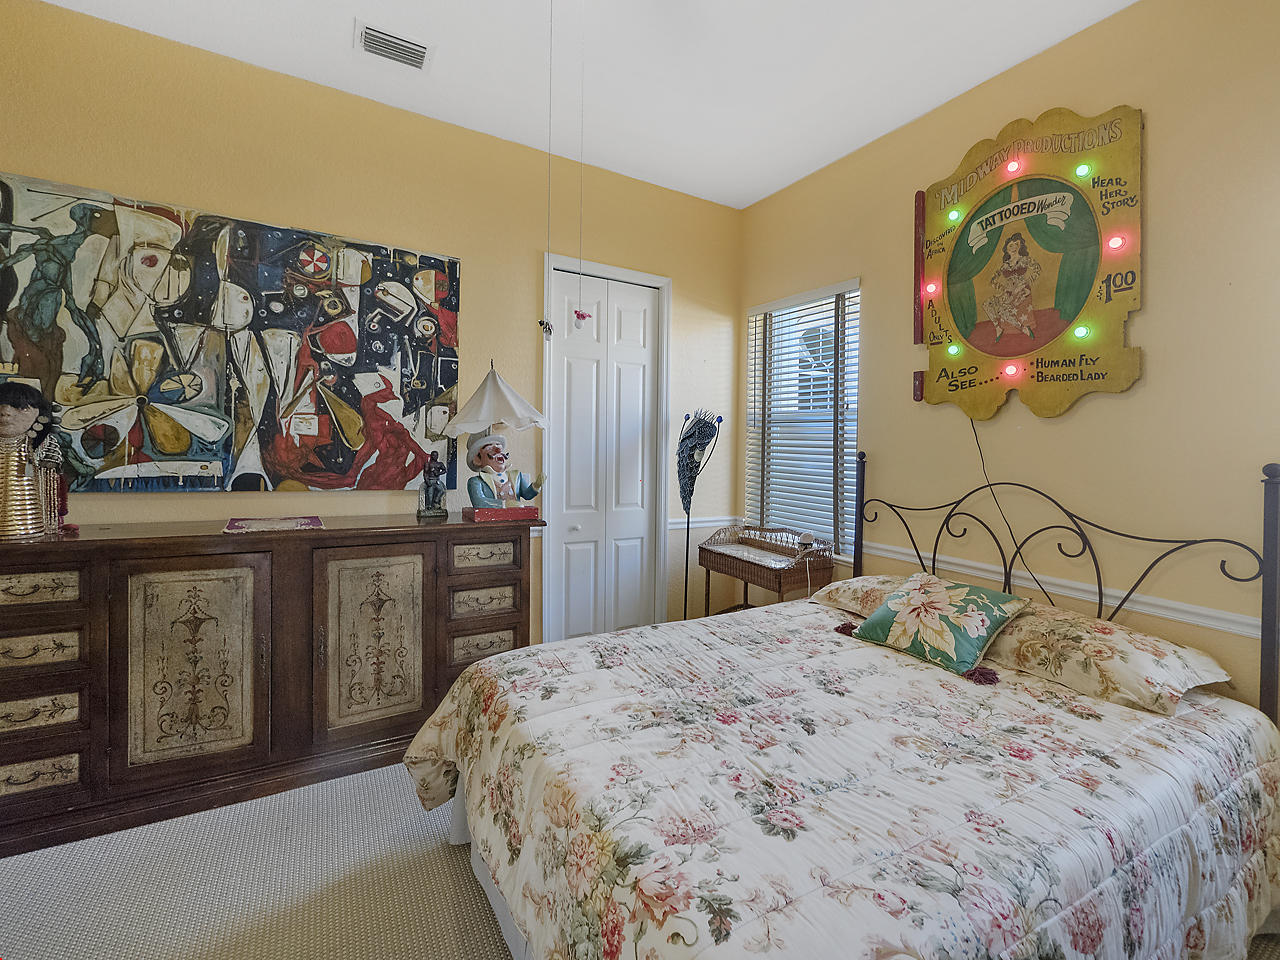 6690 Oakmont Way, West Palm Beach, Florida 33412, 3 Bedrooms Bedrooms, ,4 BathroomsBathrooms,A,Single family,Oakmont,RX-10471971